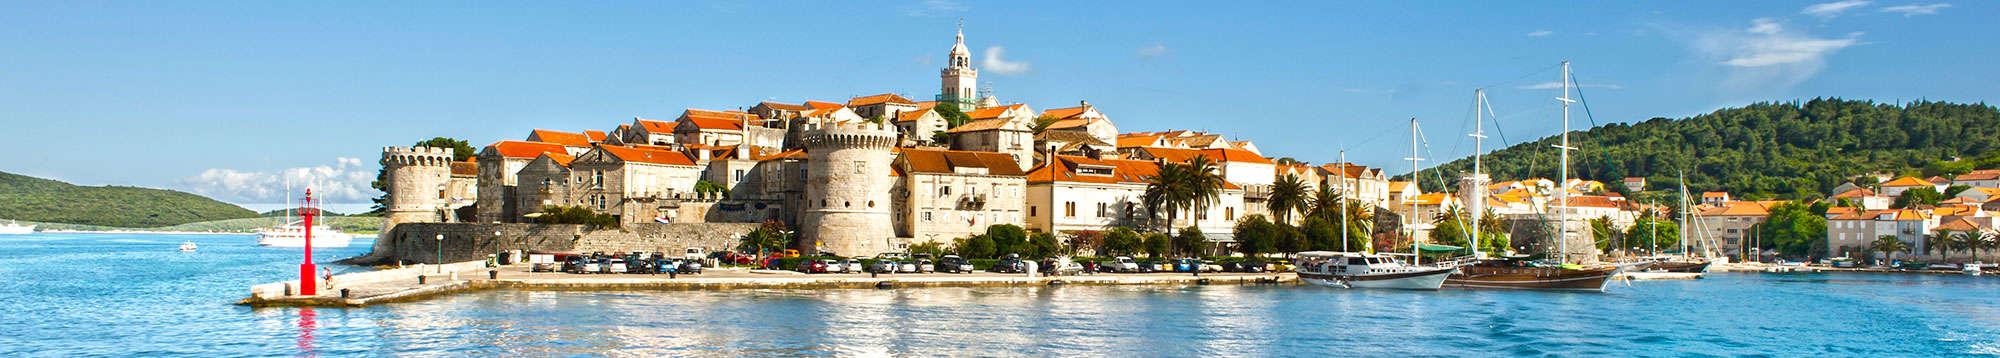 Escapadas fin de semana en Korčula